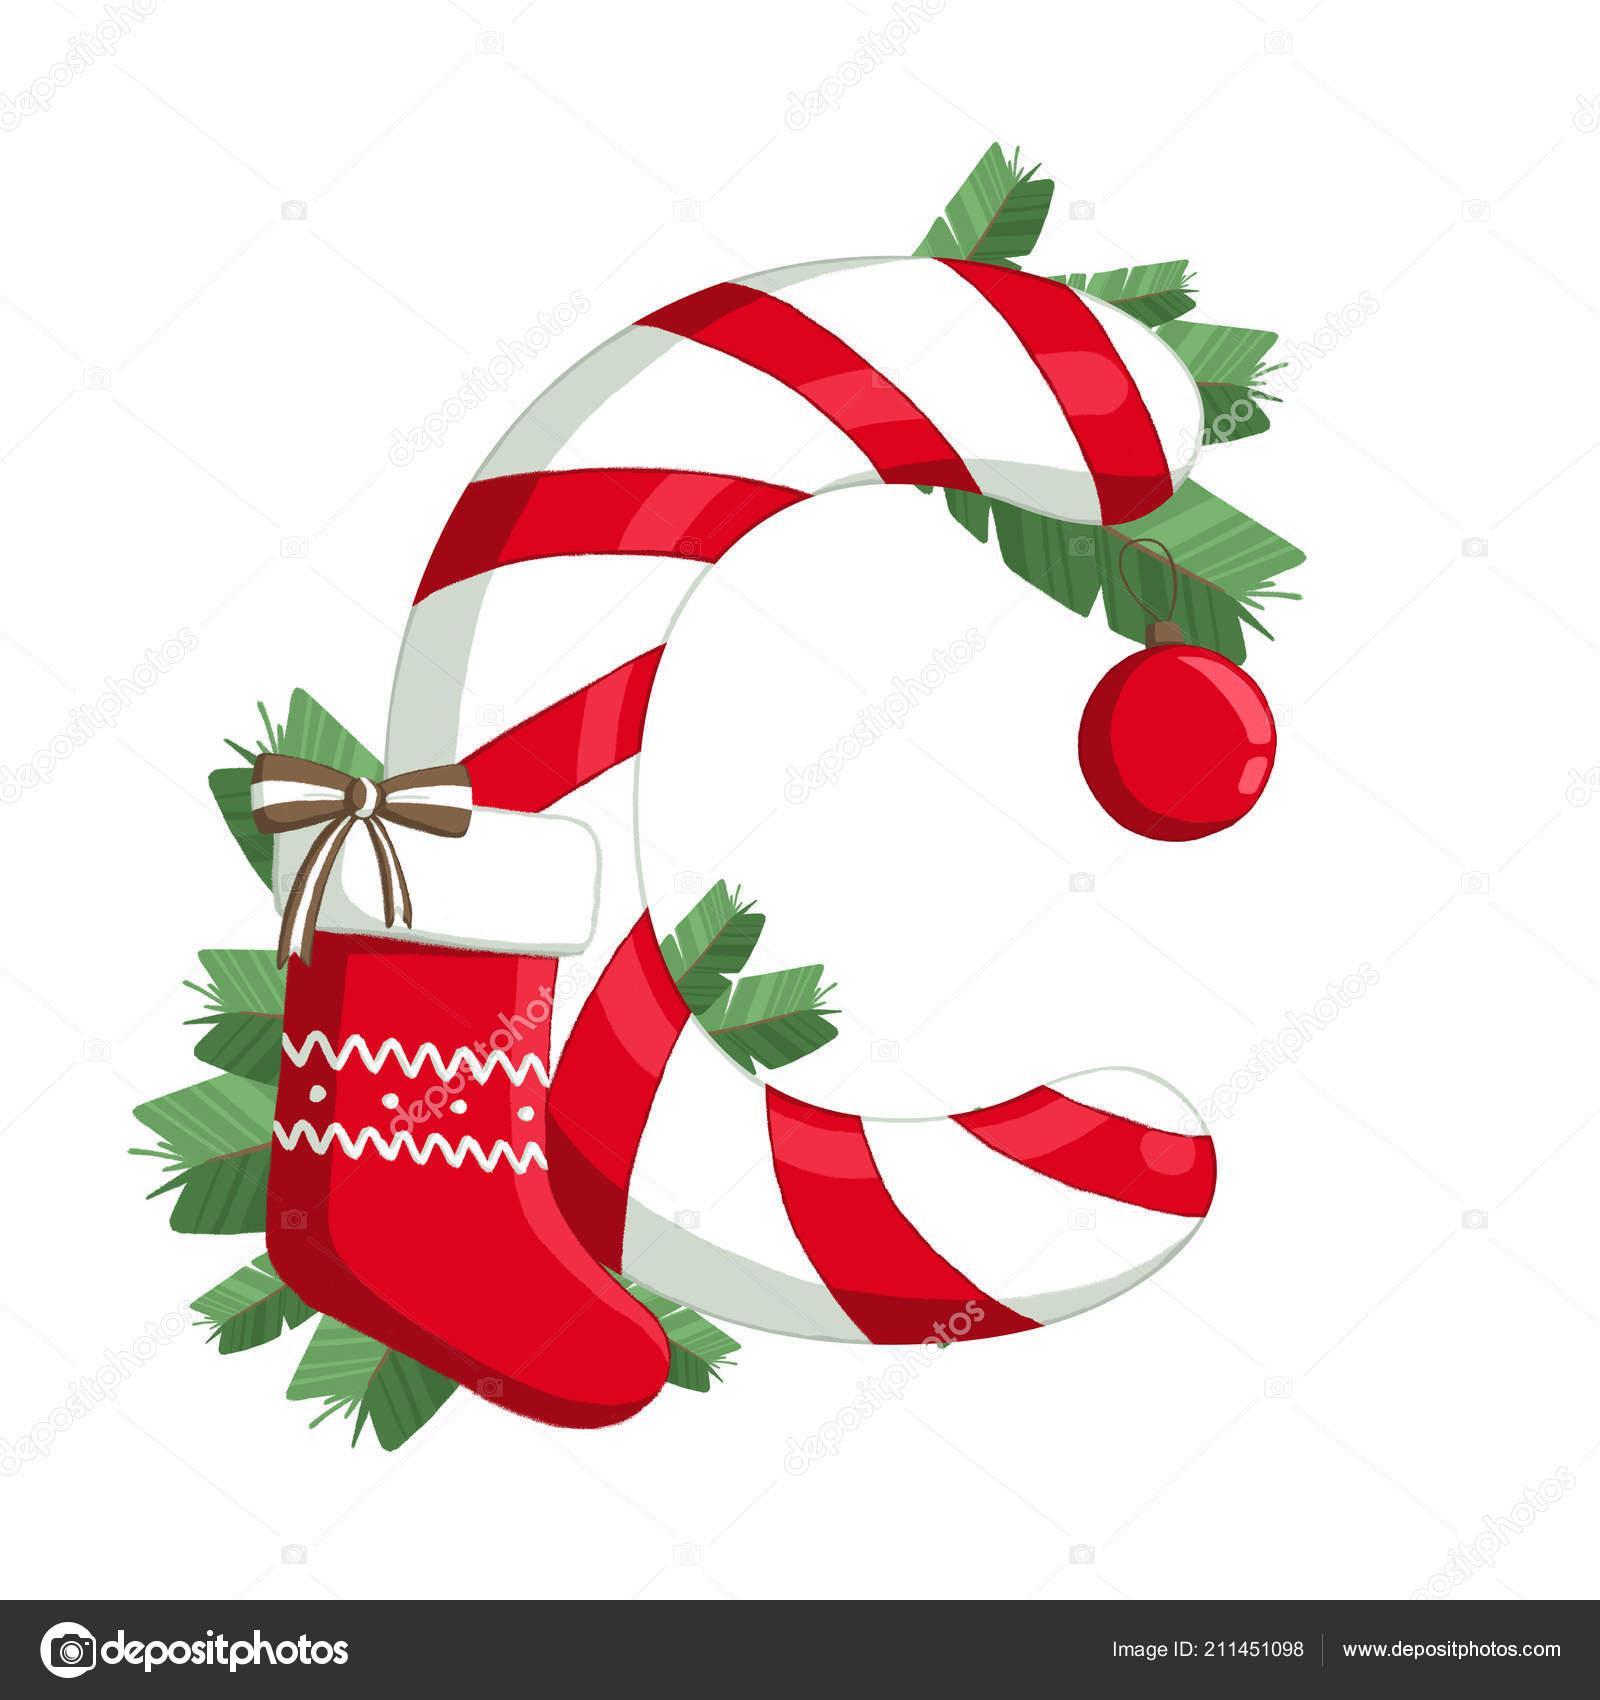 Christmas Alphabet.Christmas Alphabet Illustration Letter Tree Sock Decorations